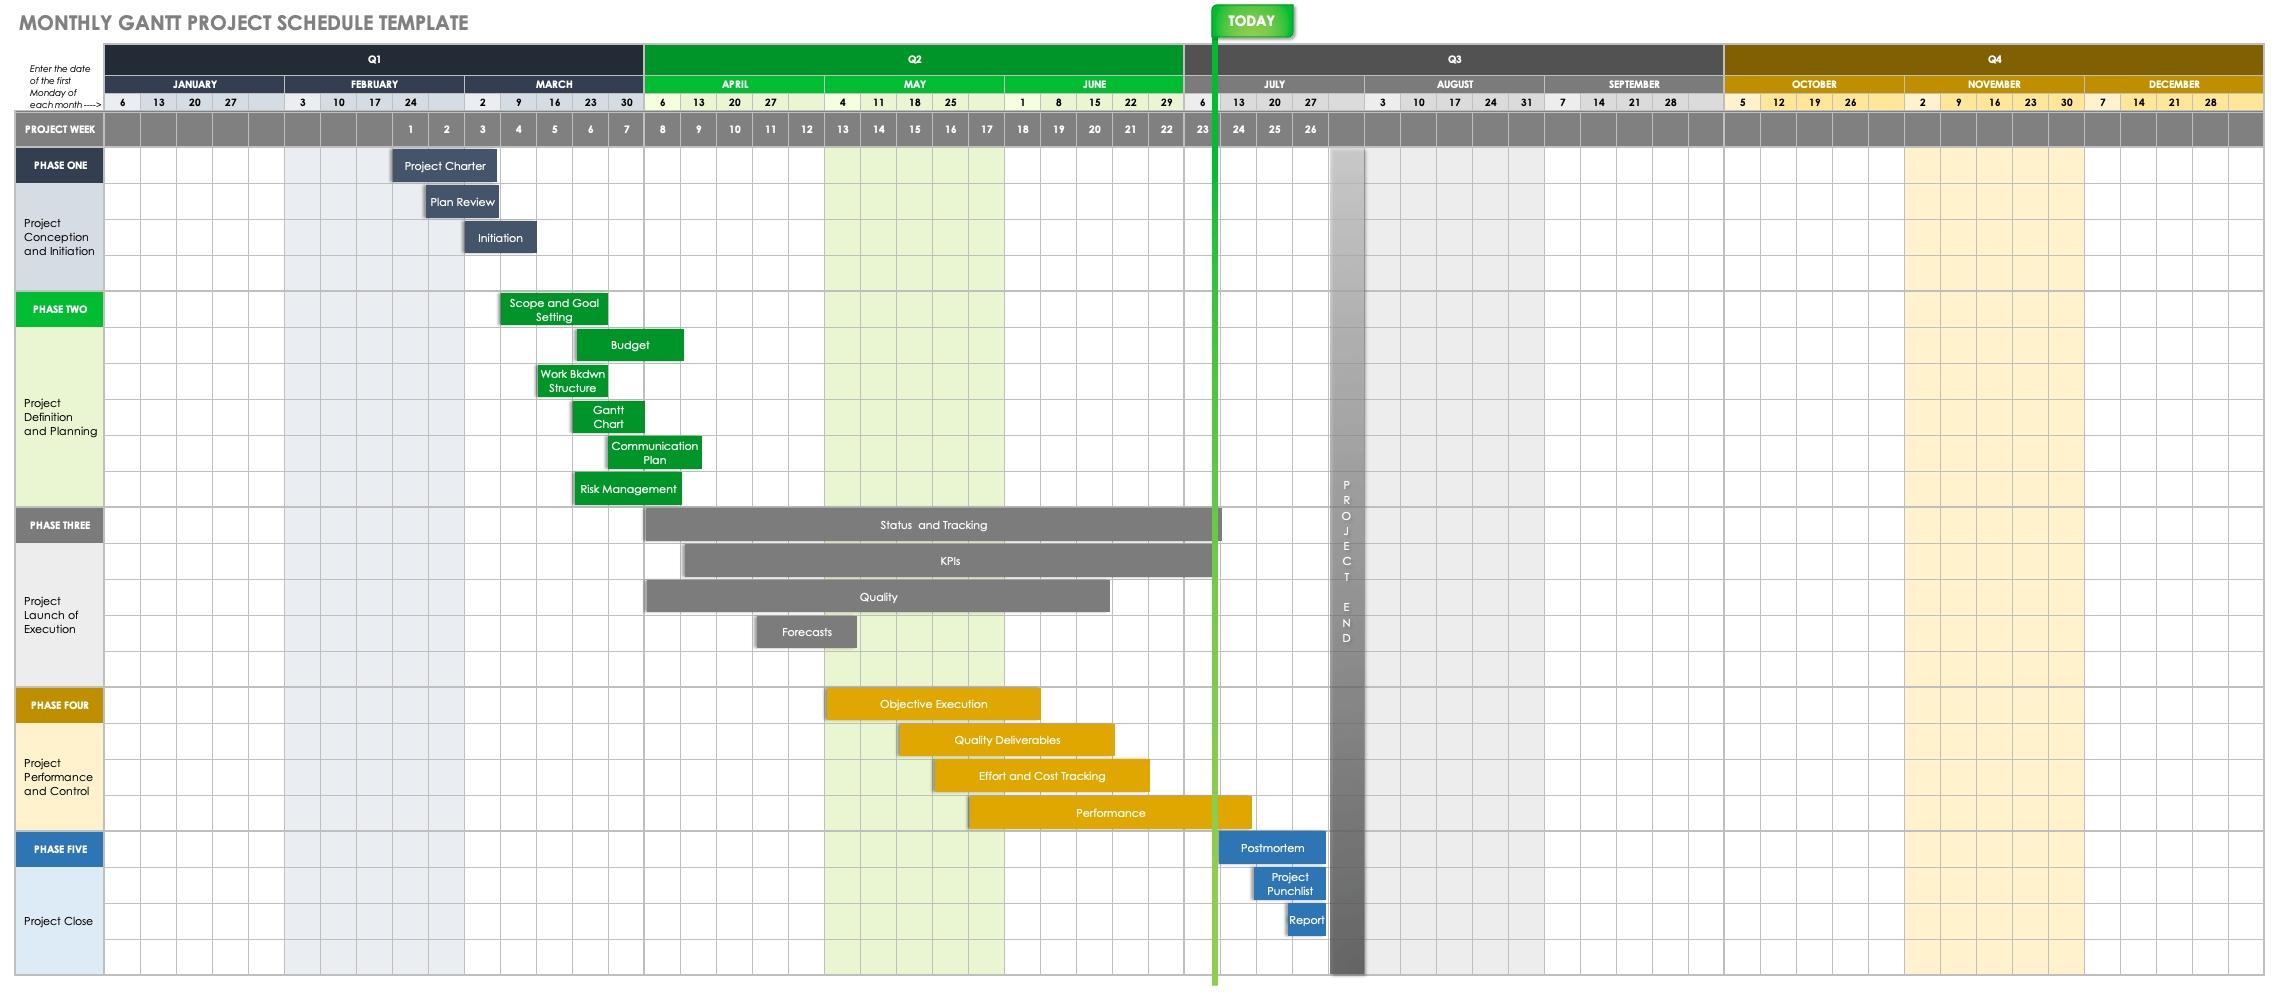 Free Project Schedule Templates | Smartsheet